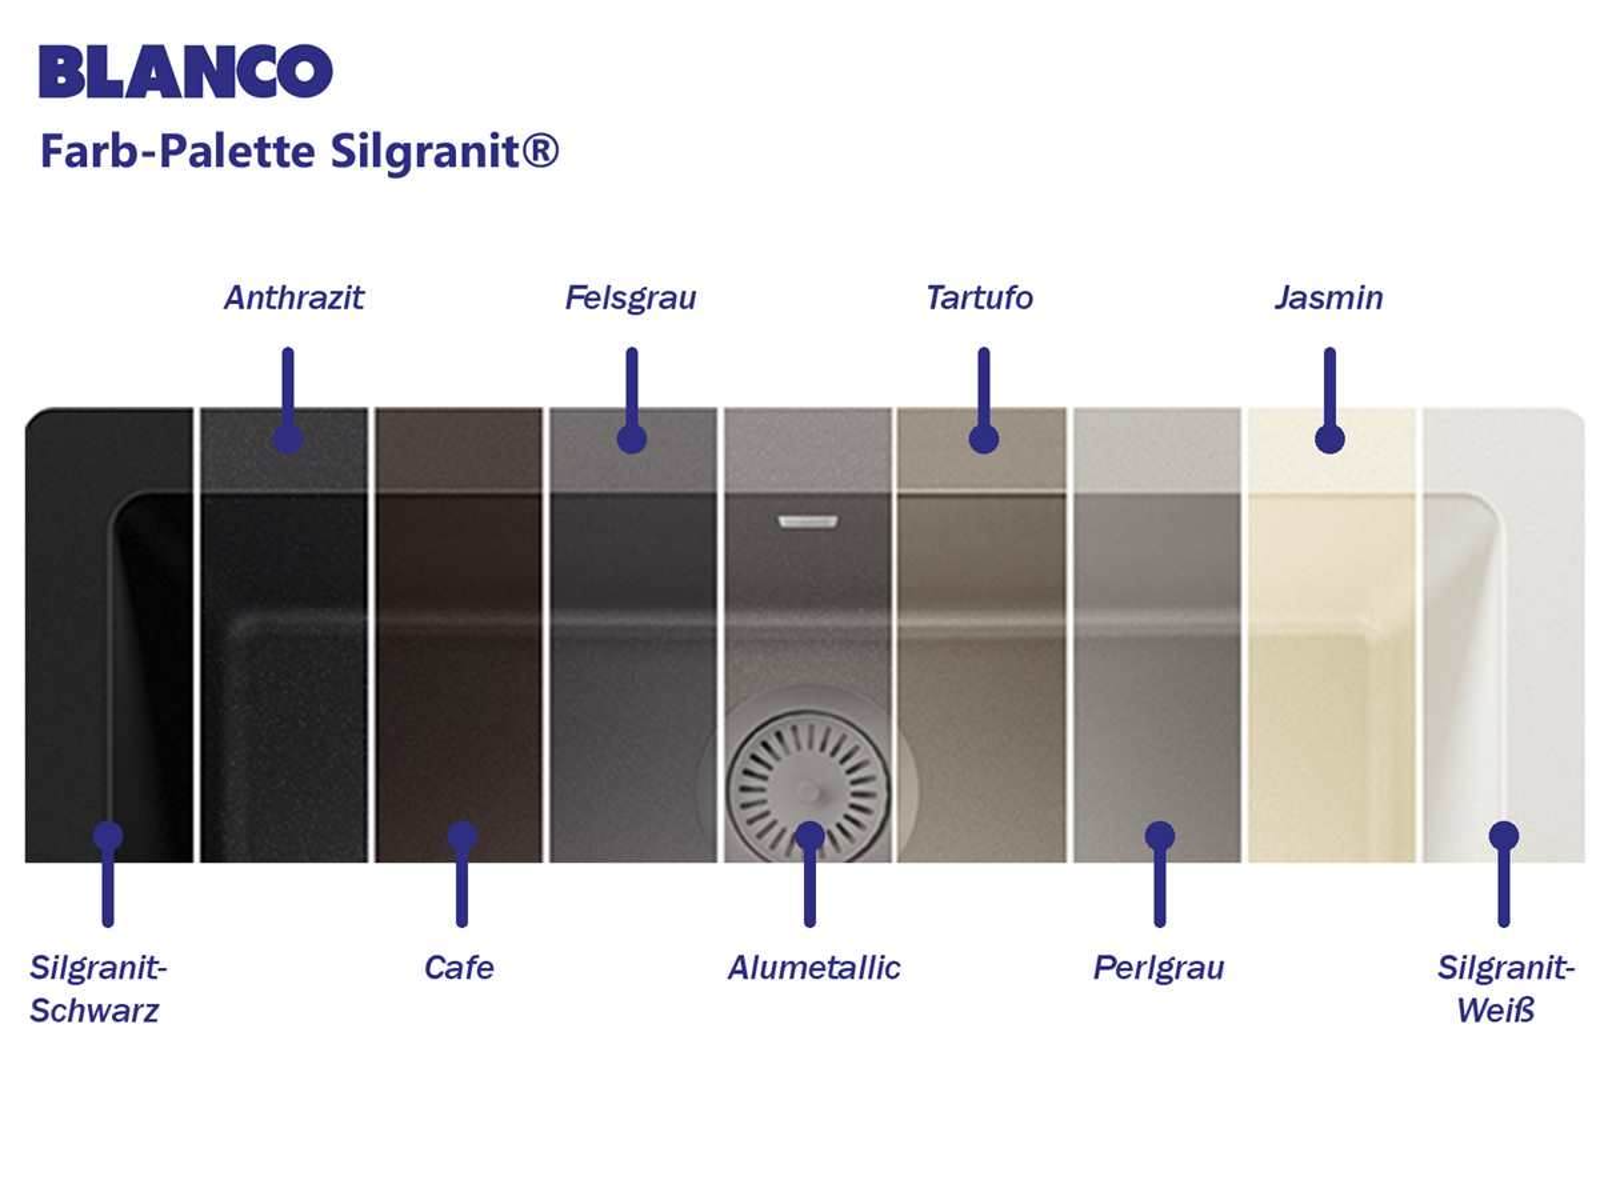 Blanco Axia III 6 S Tartufo - 523 480 Granitspüle